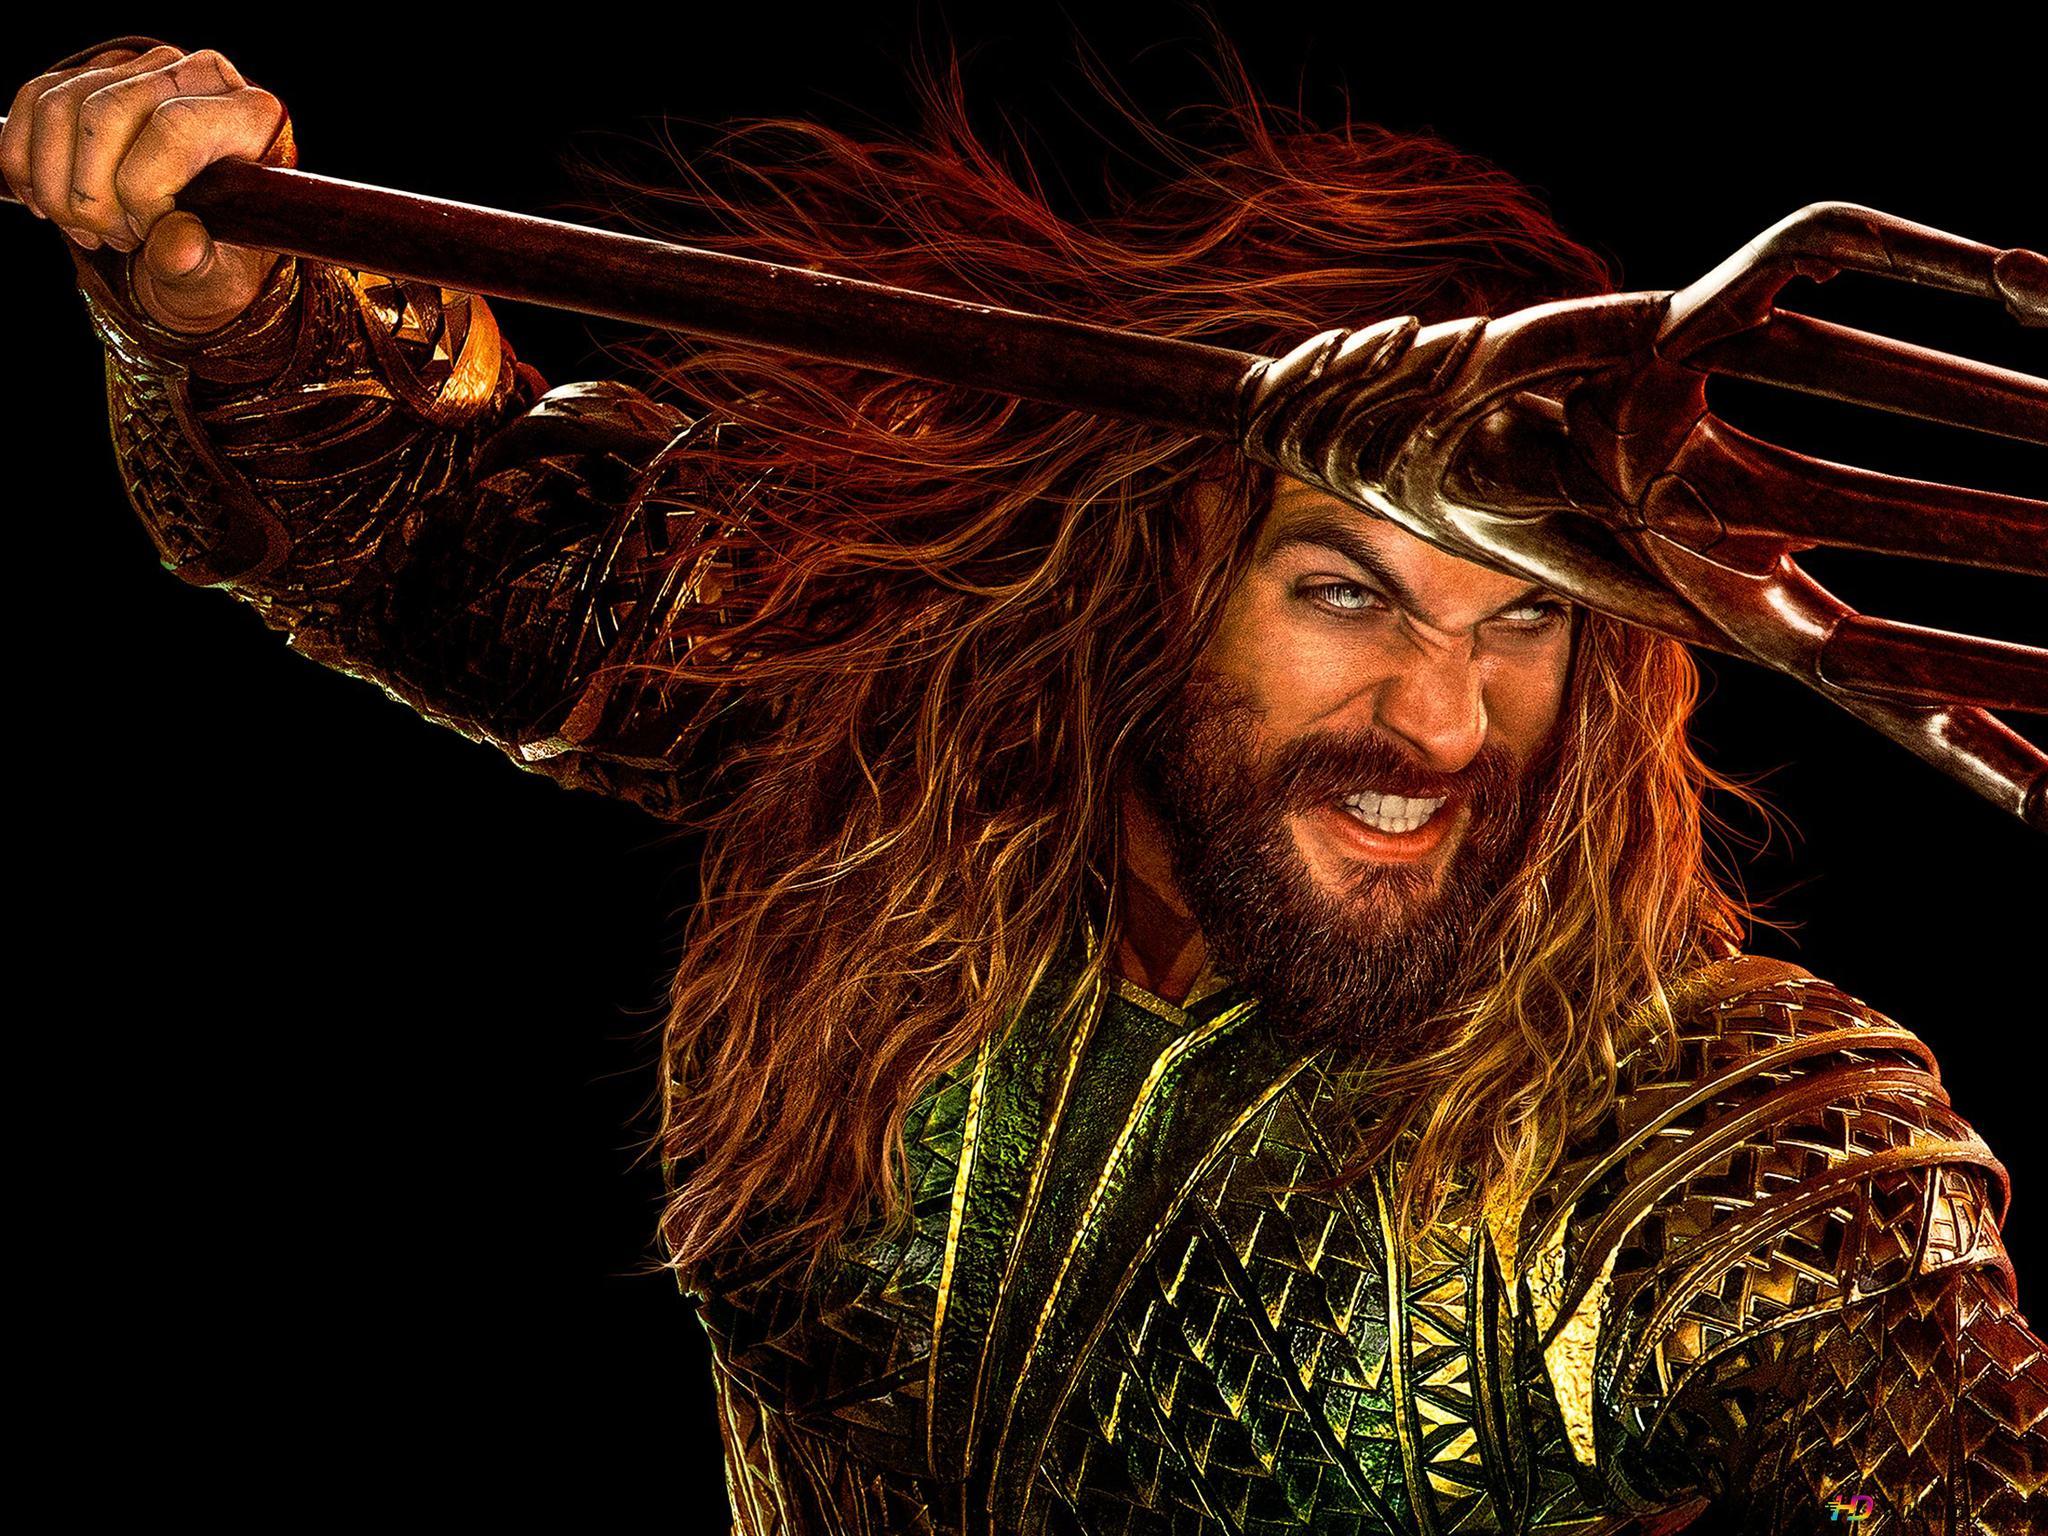 Justice League Movie Jason Momoa As Aquaman Hd Wallpaper Download